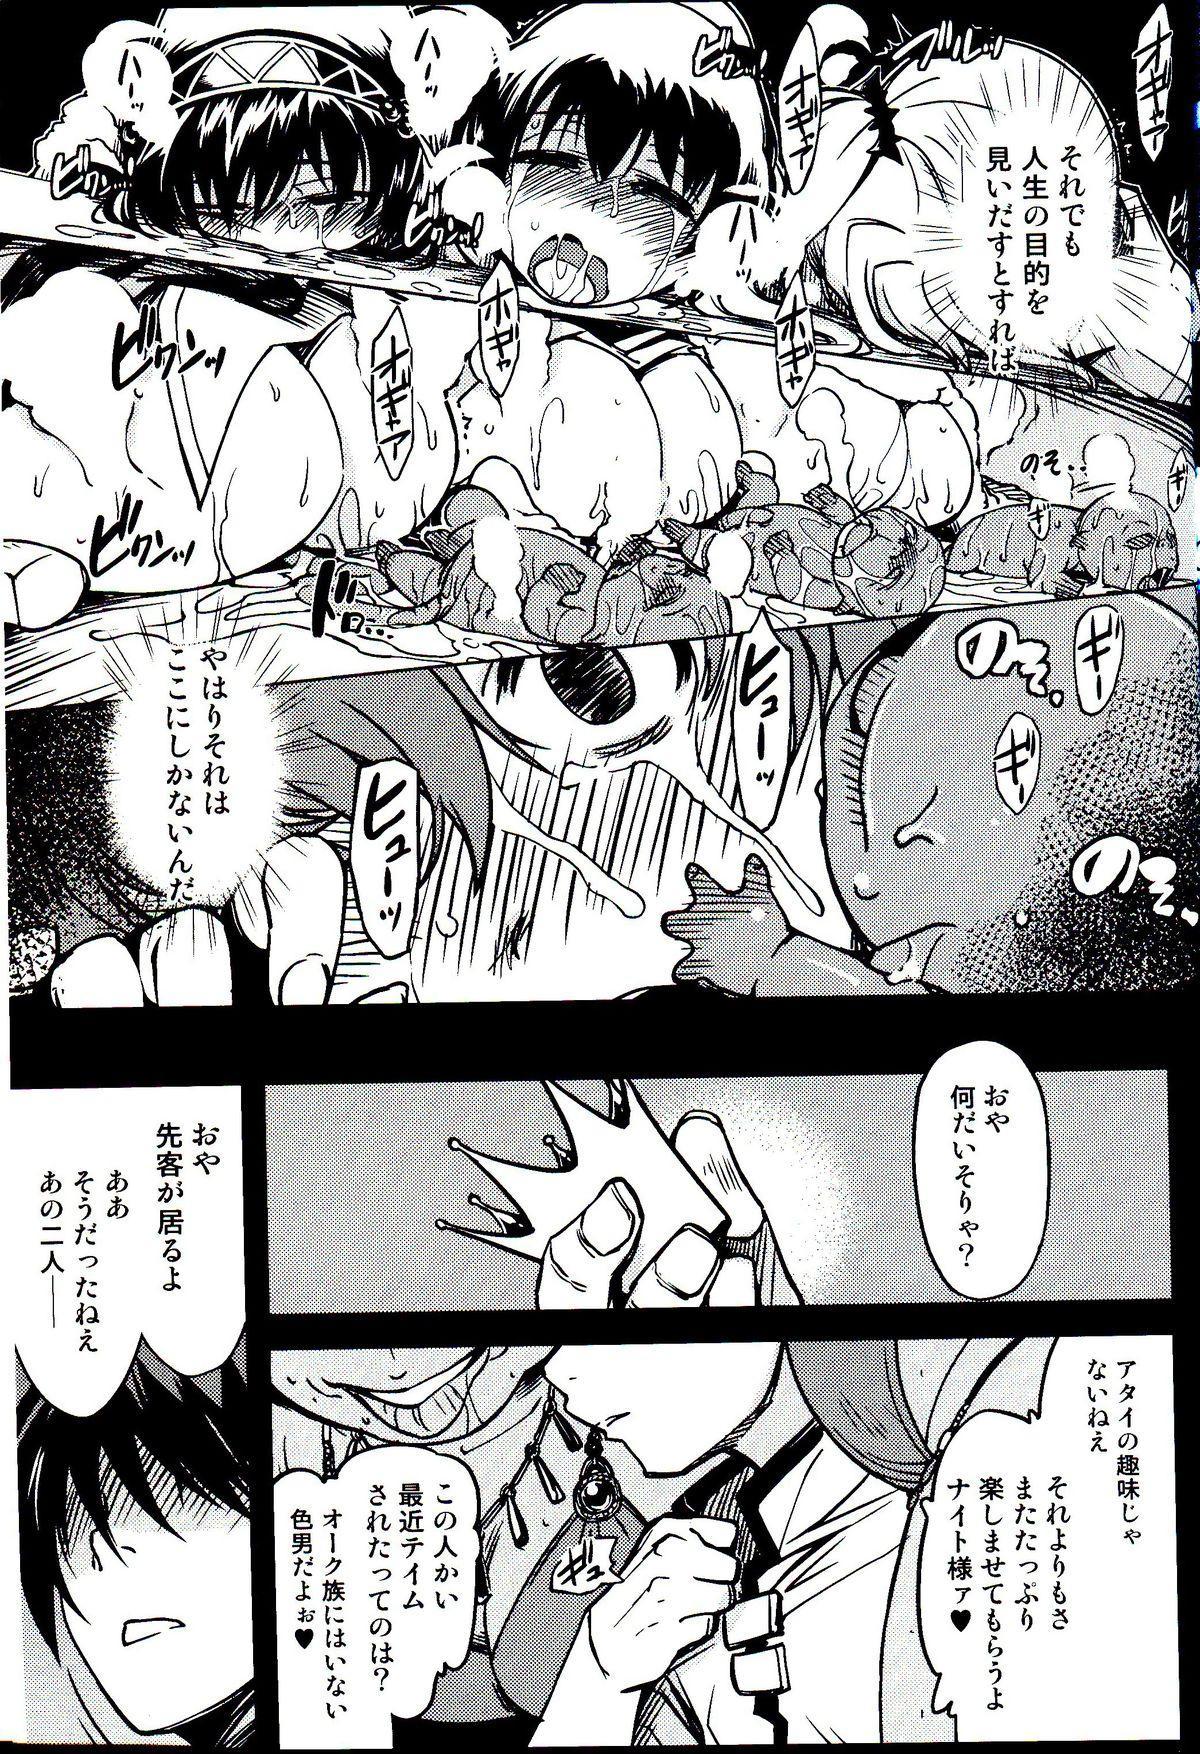 Hime Kishi Tame 3 46